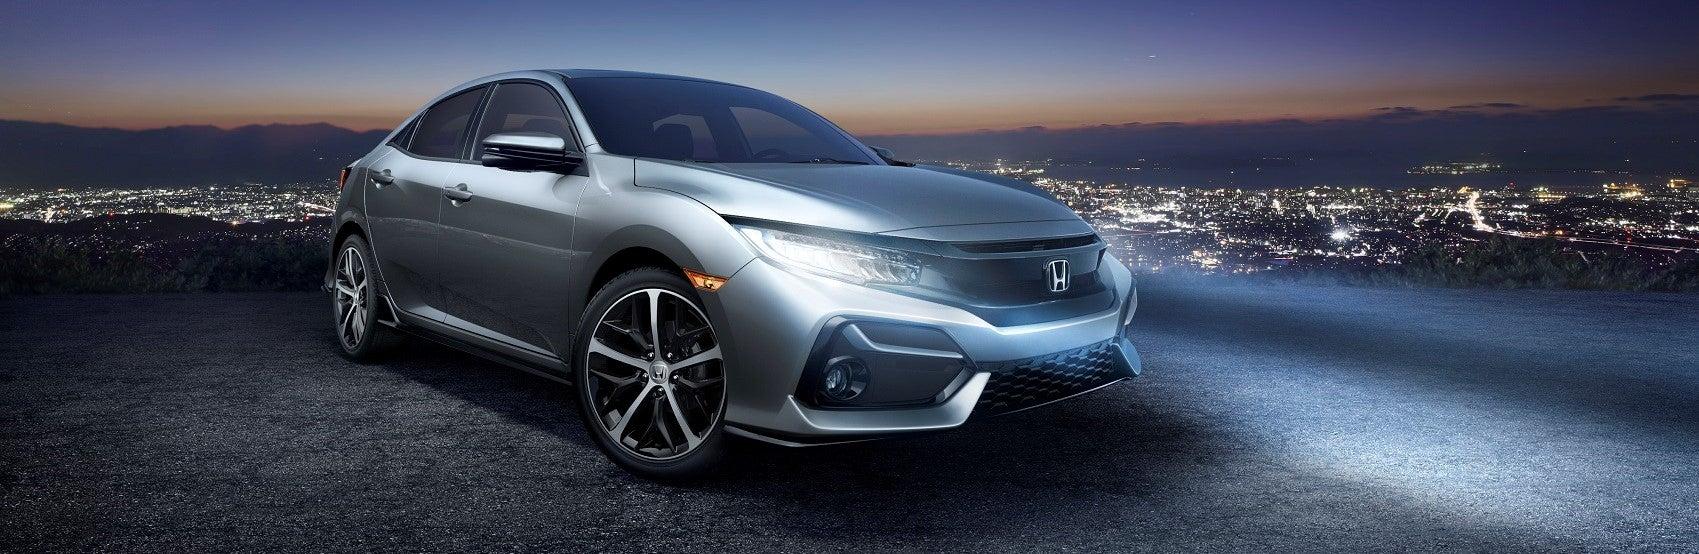 Honda Civic for Sale Mechanicsburg PA